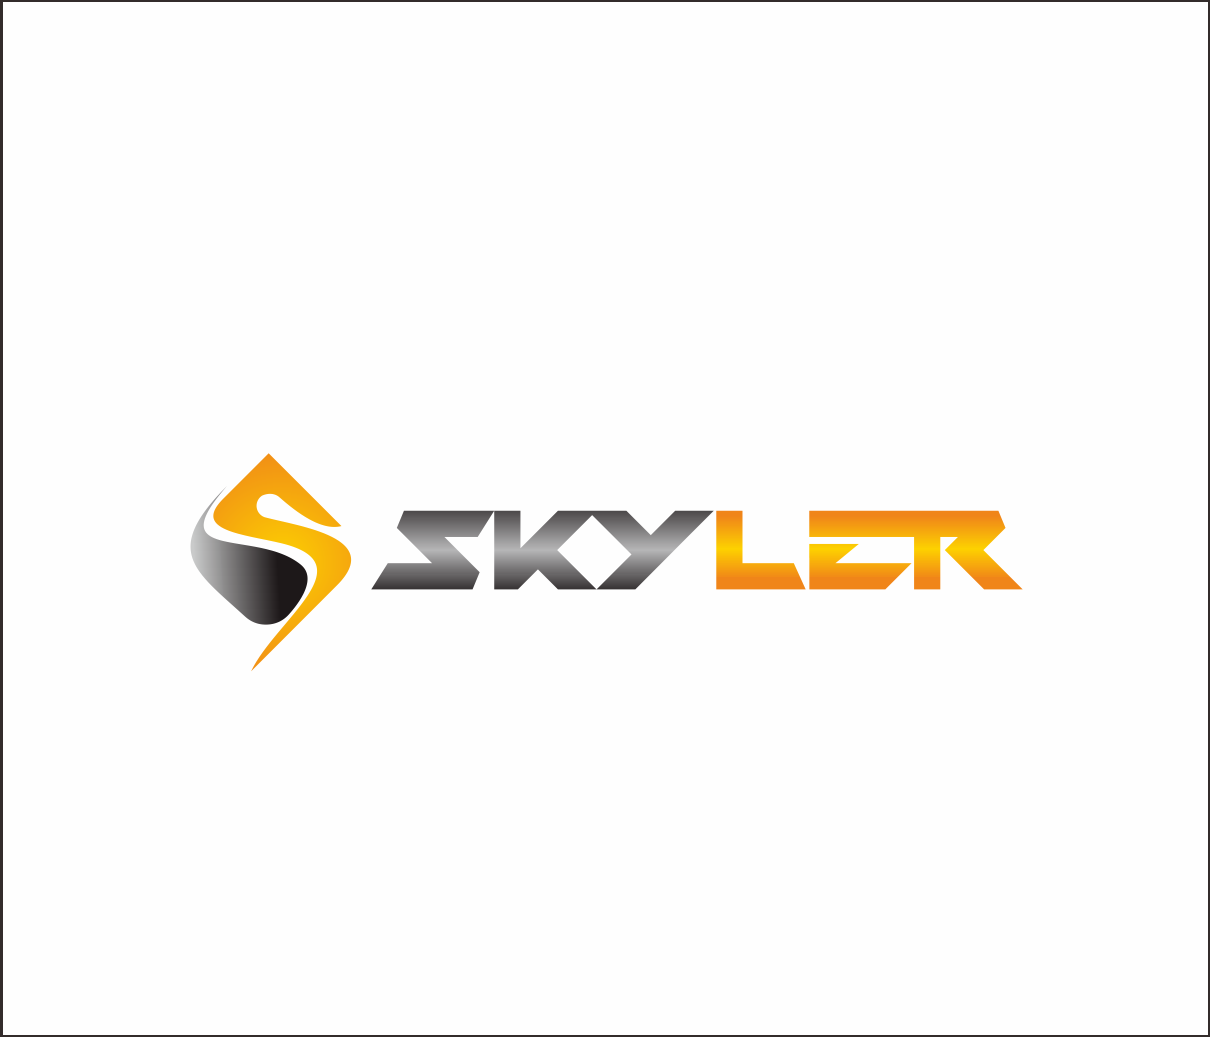 Logo Design by Armada Jamaluddin - Entry No. 250 in the Logo Design Contest Artistic Logo Design for Skyler.Asia.